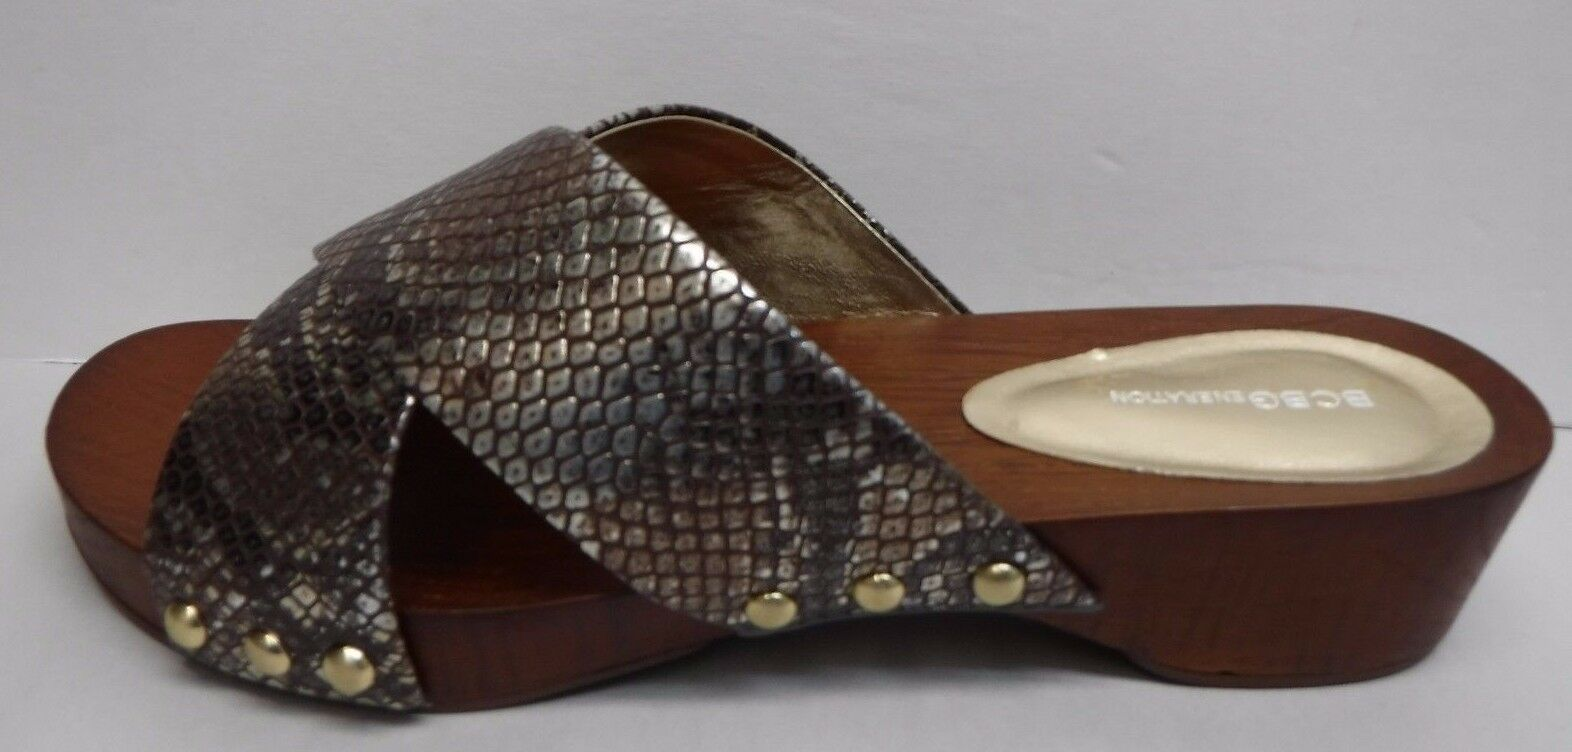 BCBG BCBGeneration Größe 9.5 Slide Sandales NEU Damenschuhe Schuhes